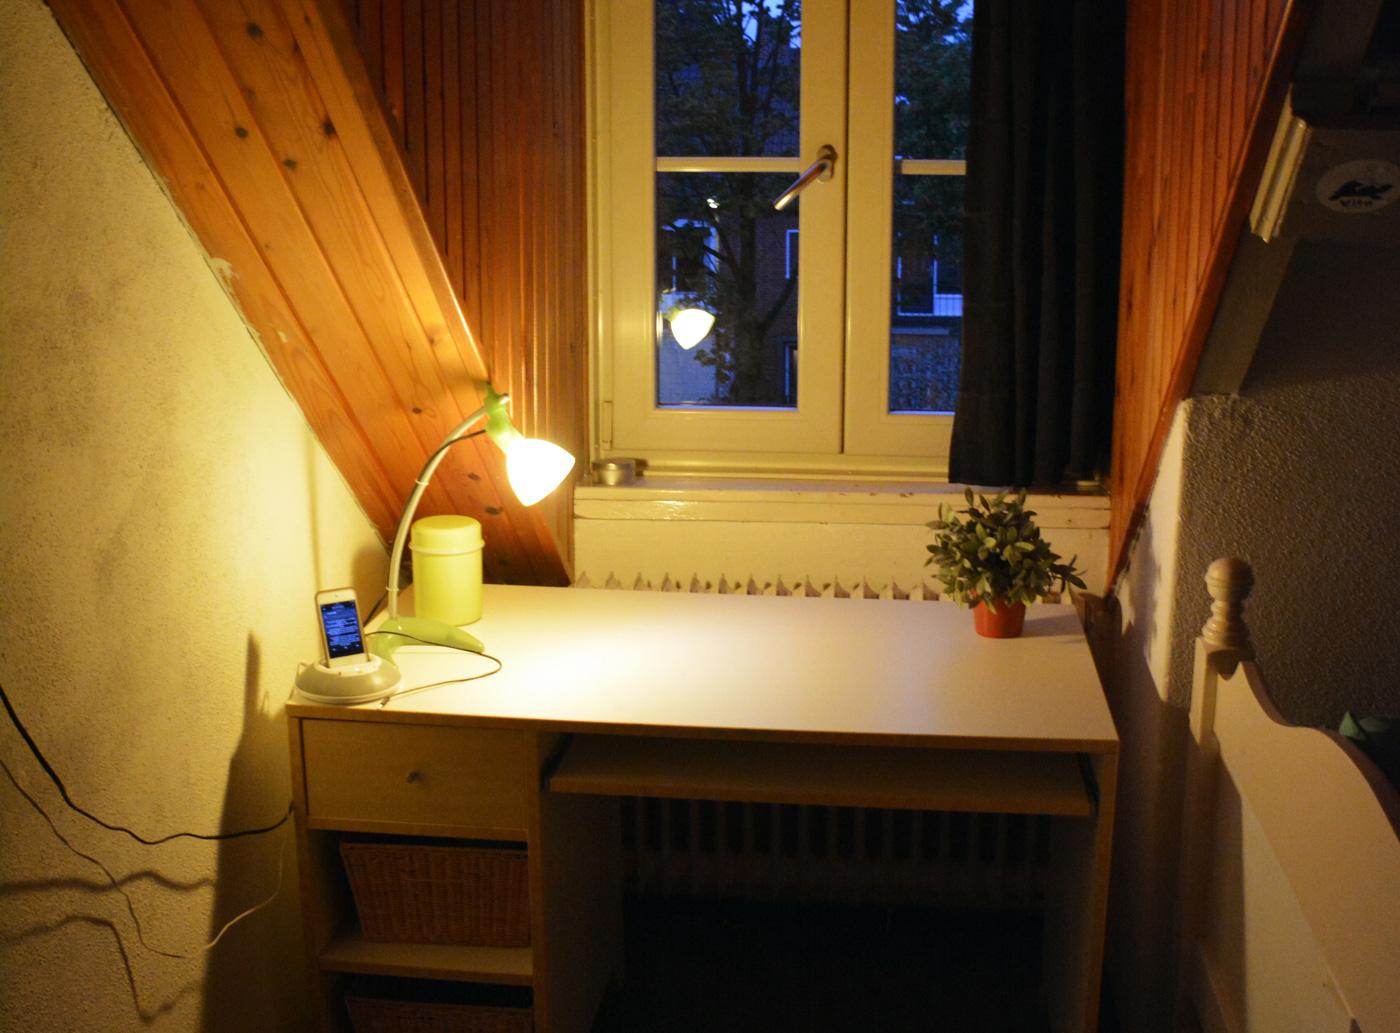 Een klein interieur gezellig inrichten   Interveste   INFONET